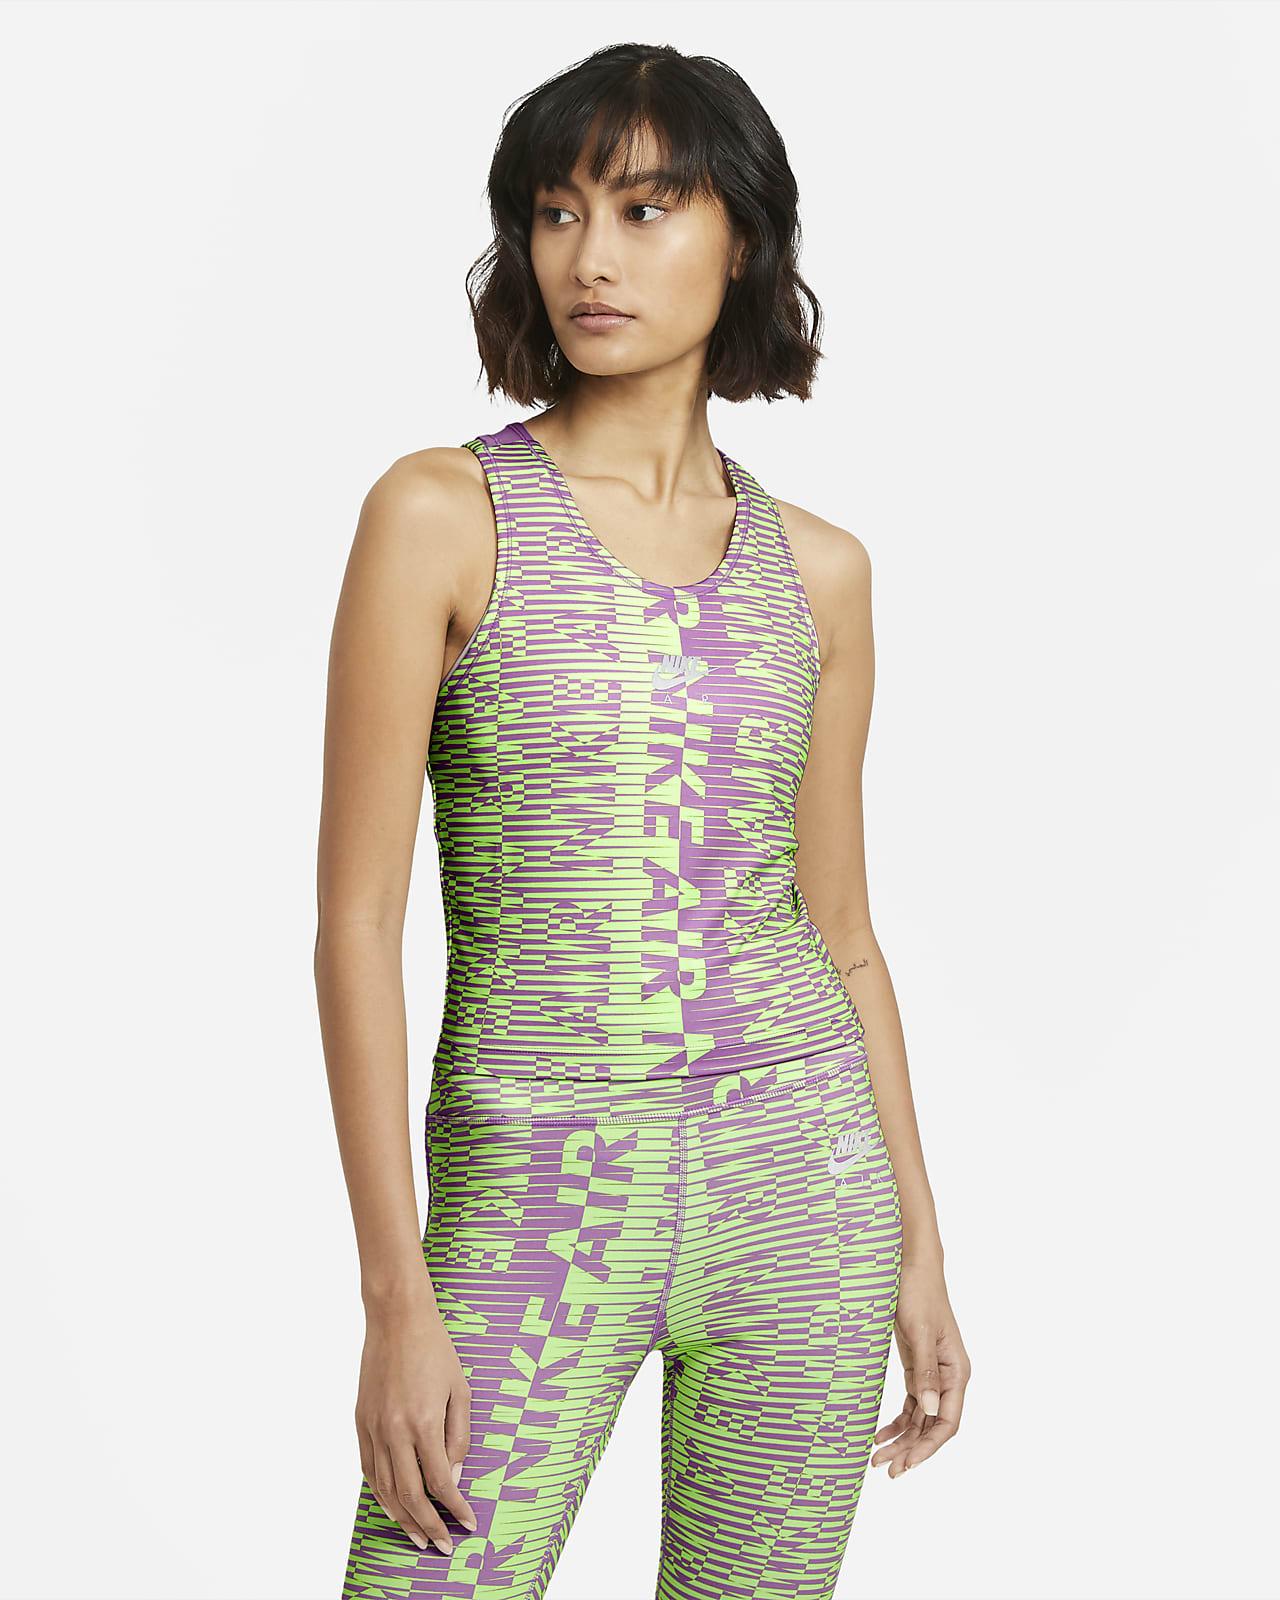 Camisola de running sem mangas estampada Nike Air para mulher